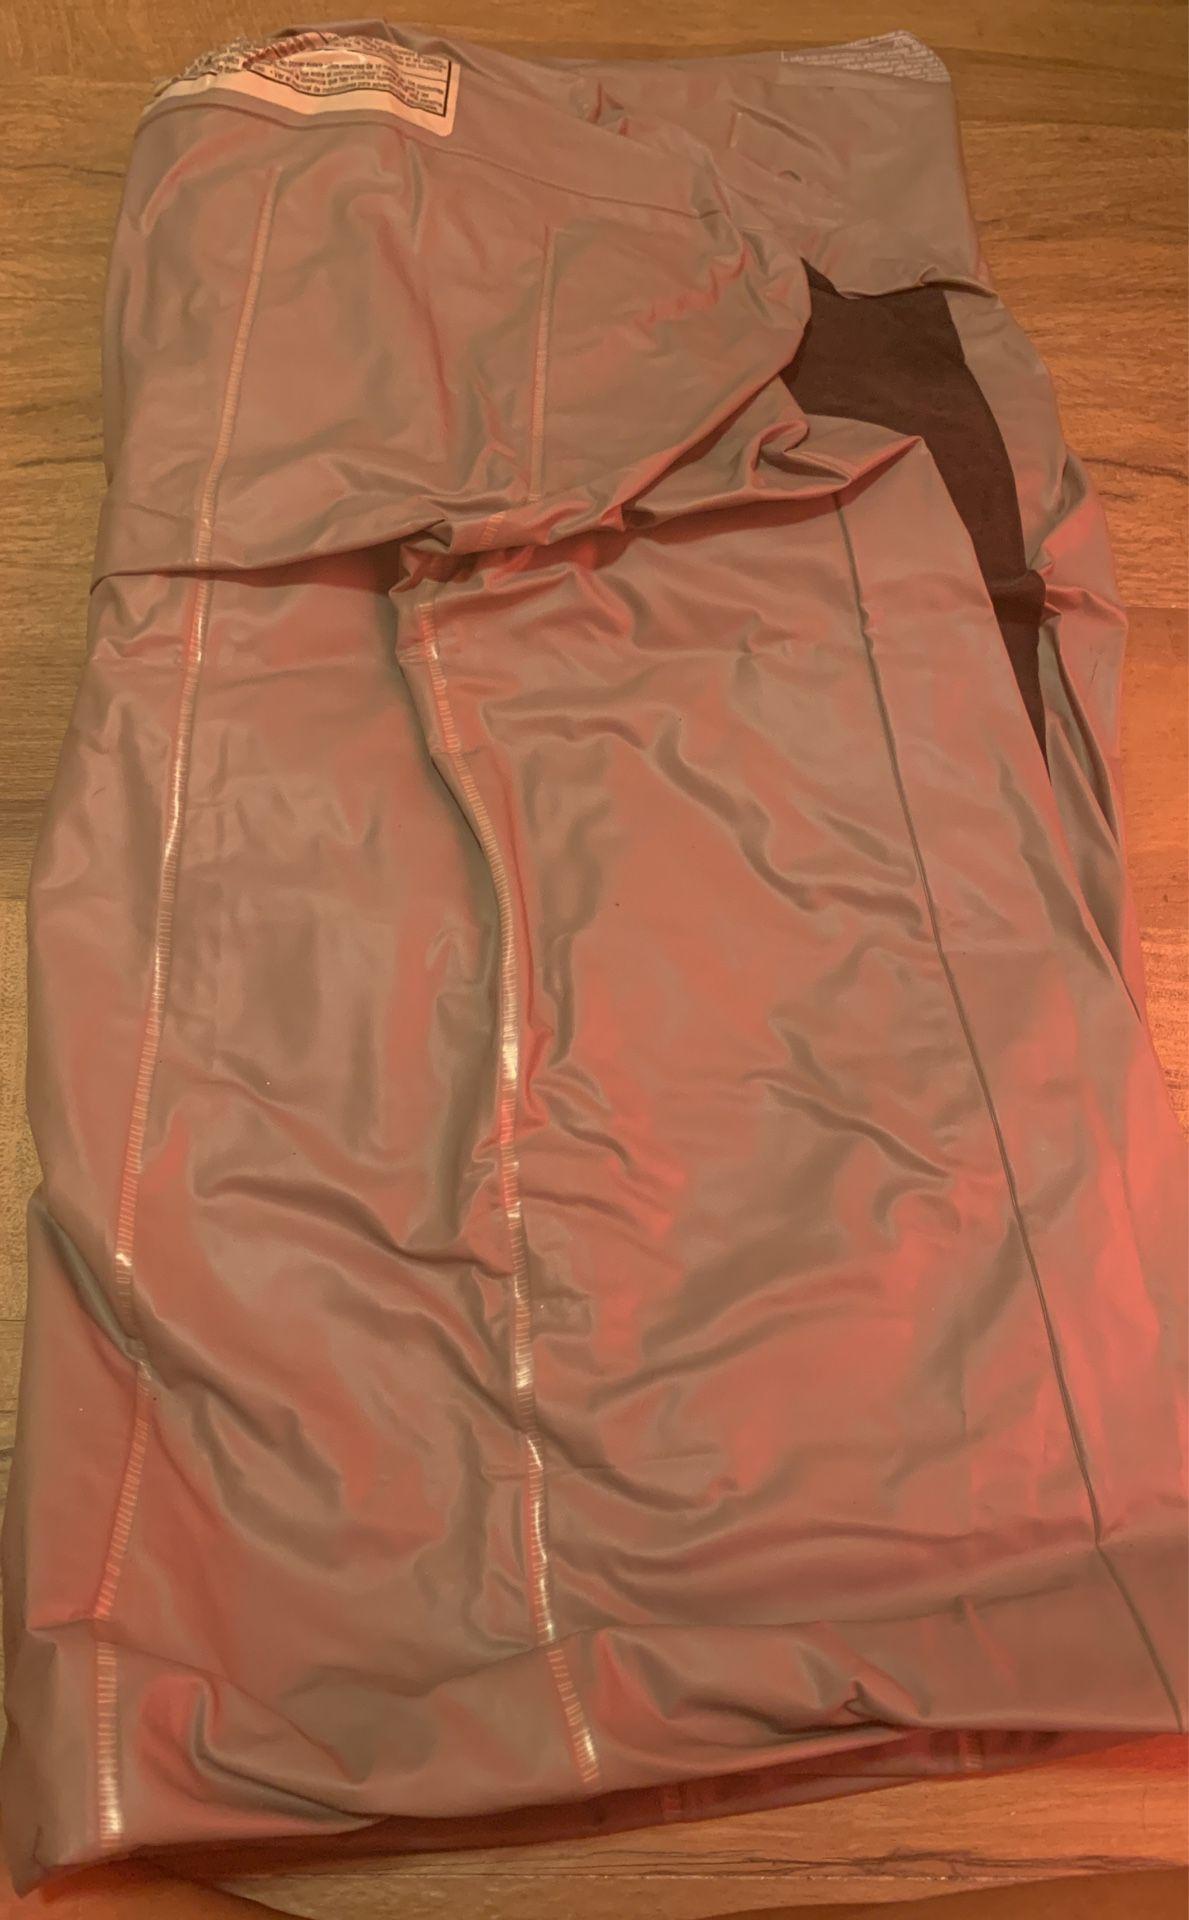 3 inflatable mattress/ Queen/ Twin